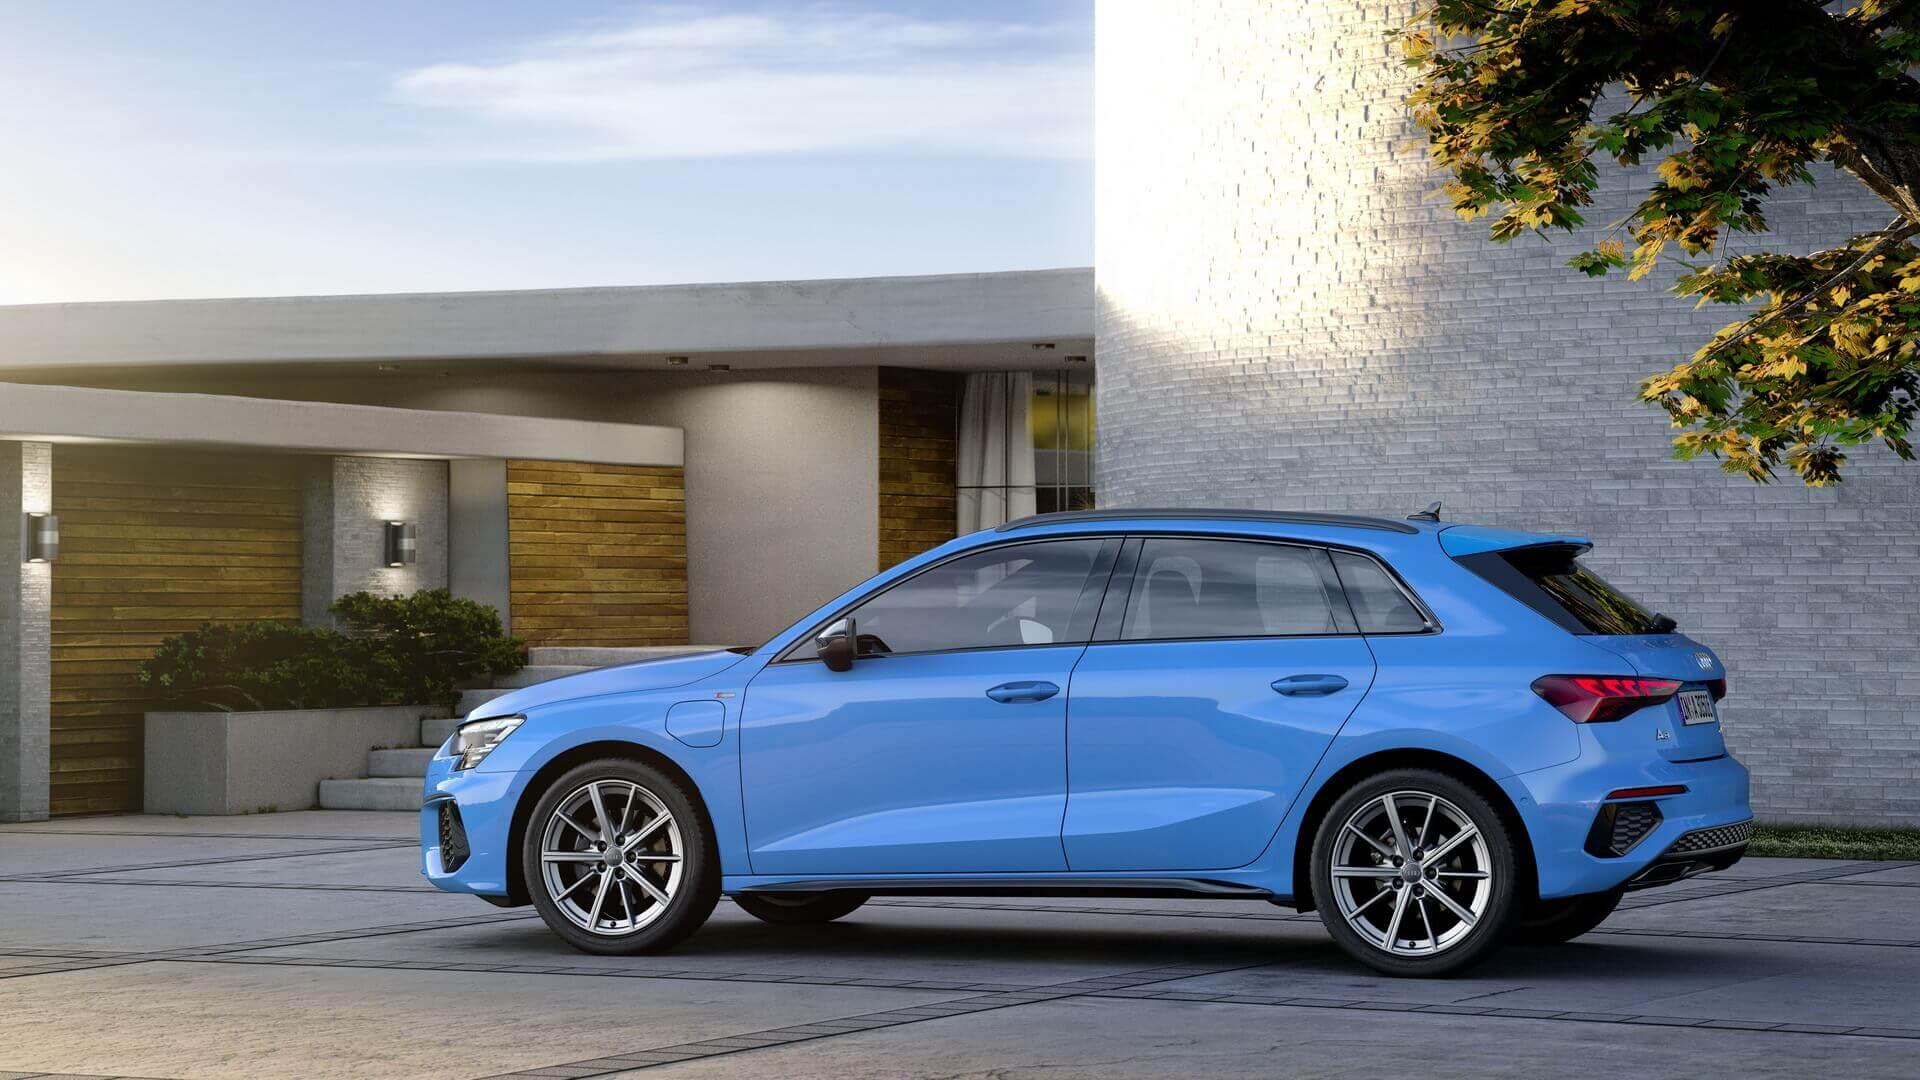 Audi A3 Sportback получила новую плагин-гибридную версию 40 TFSI e